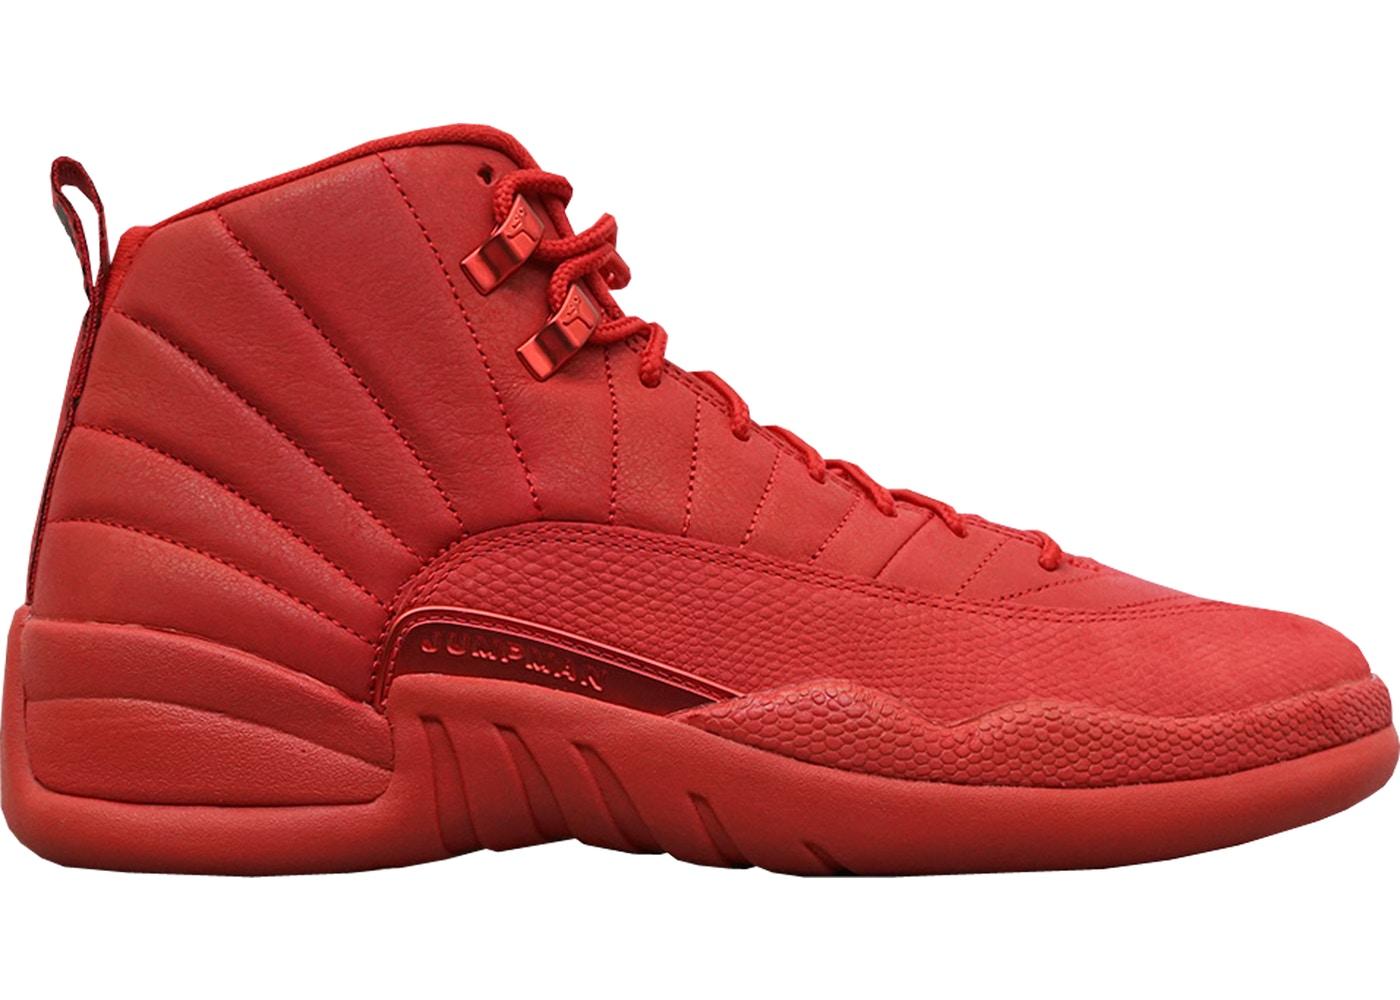 Kick Avenue - Jordan 12 Retro Gym Red